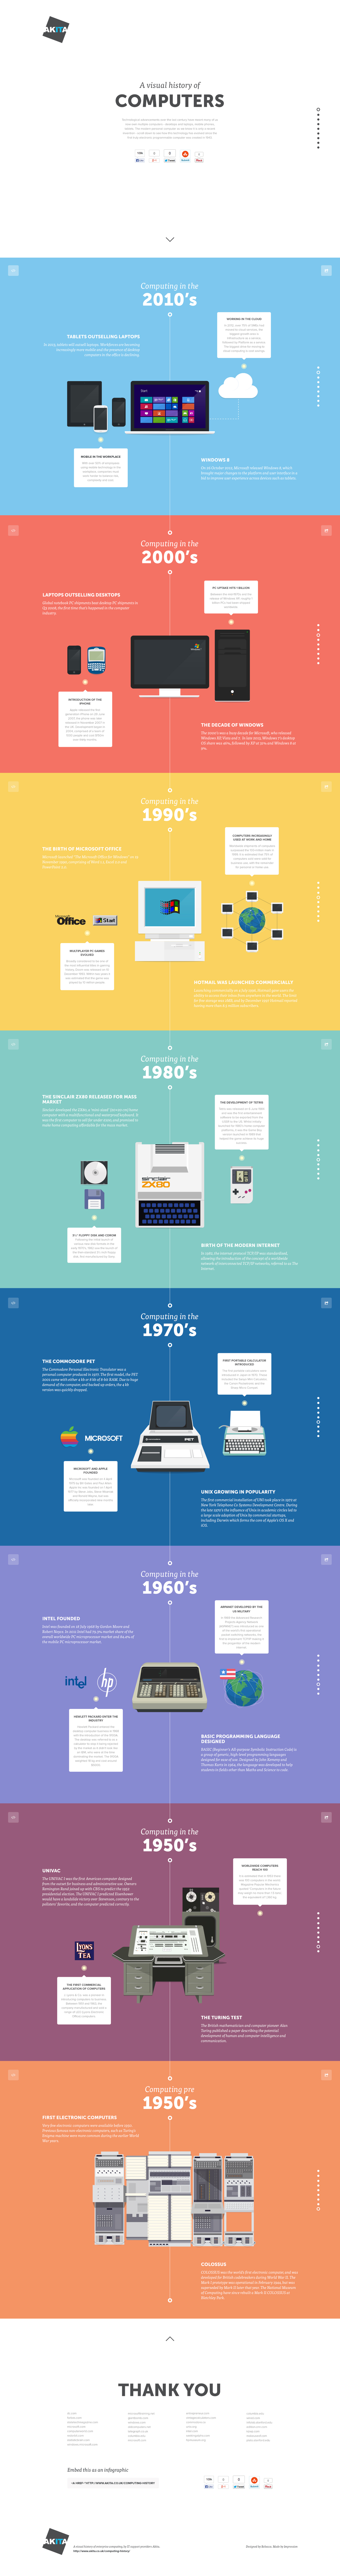 Historia visual de los ordenadores #infografia #infographic